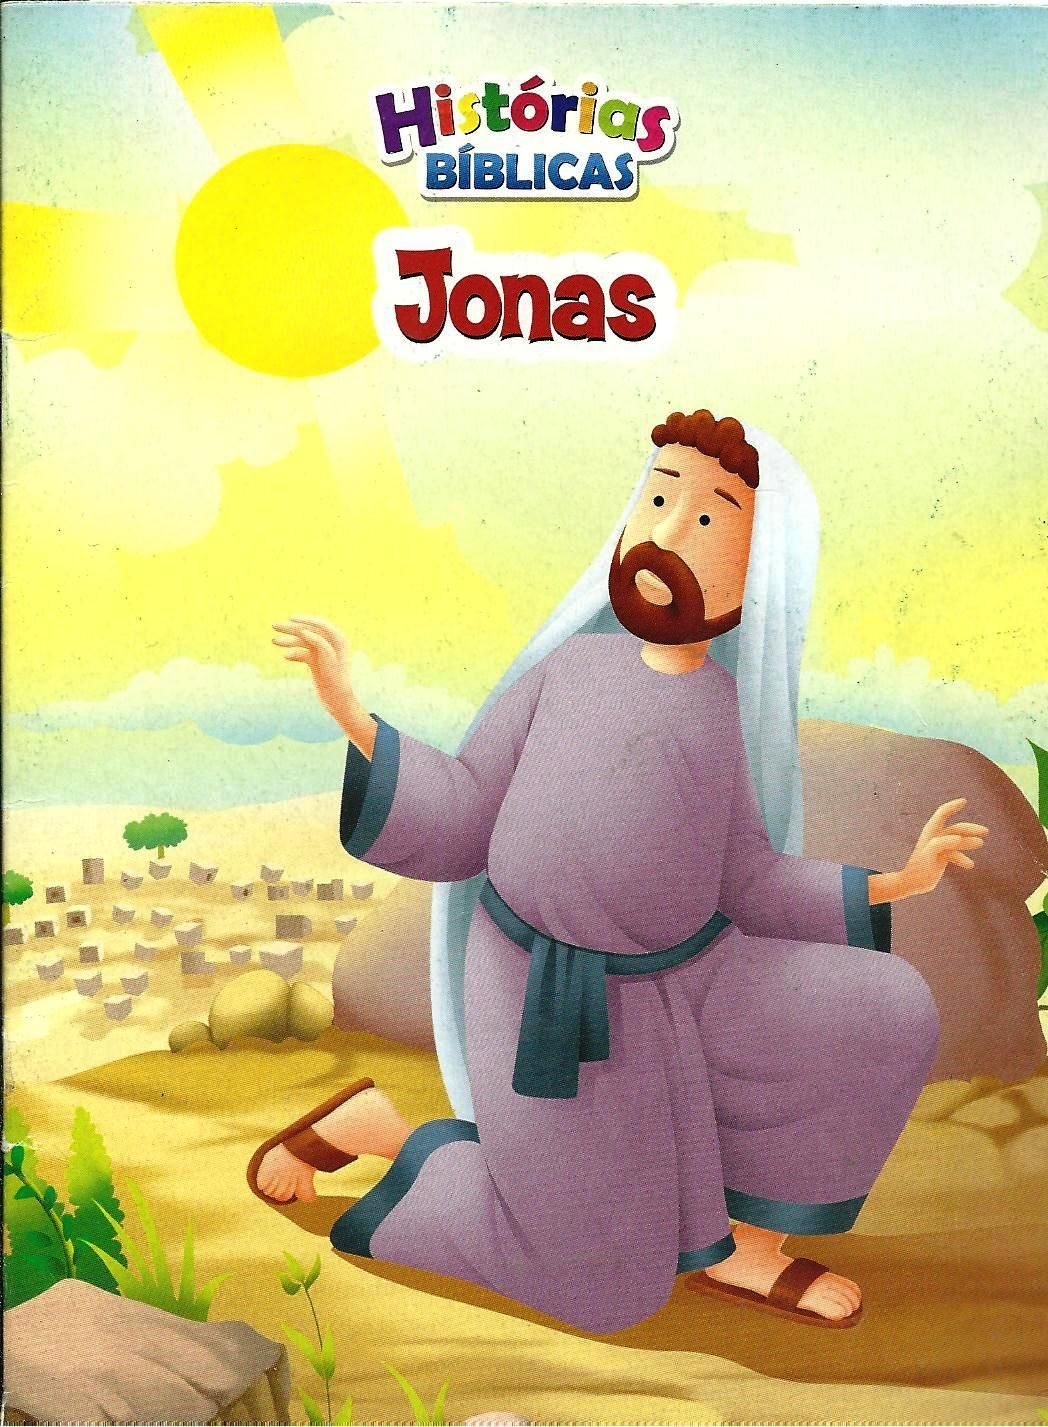 História bíblica- Jonas   dibujos biblicos   Pinterest   Trabajos ...